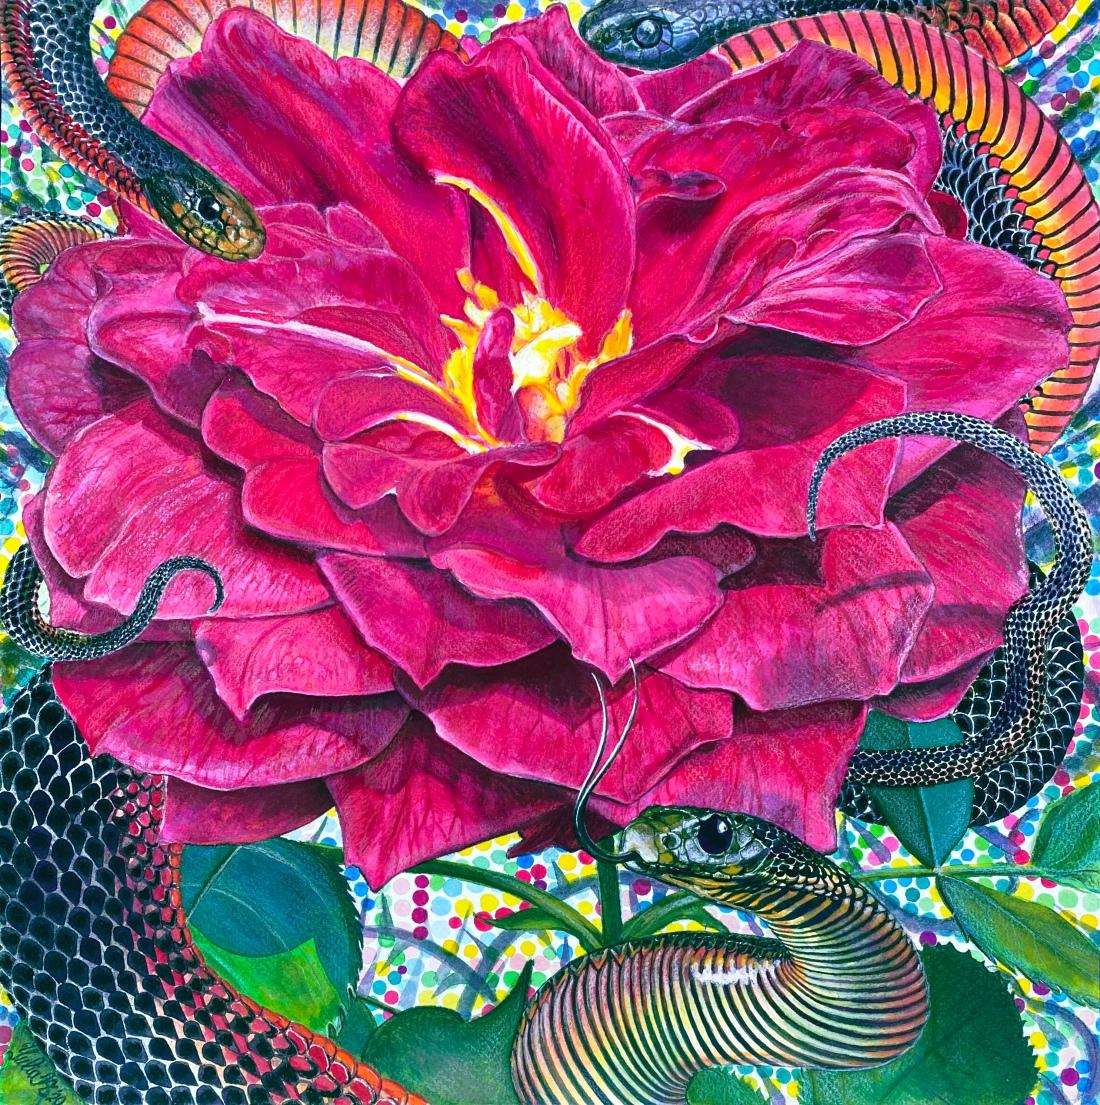 Flower Serpent Composition #1